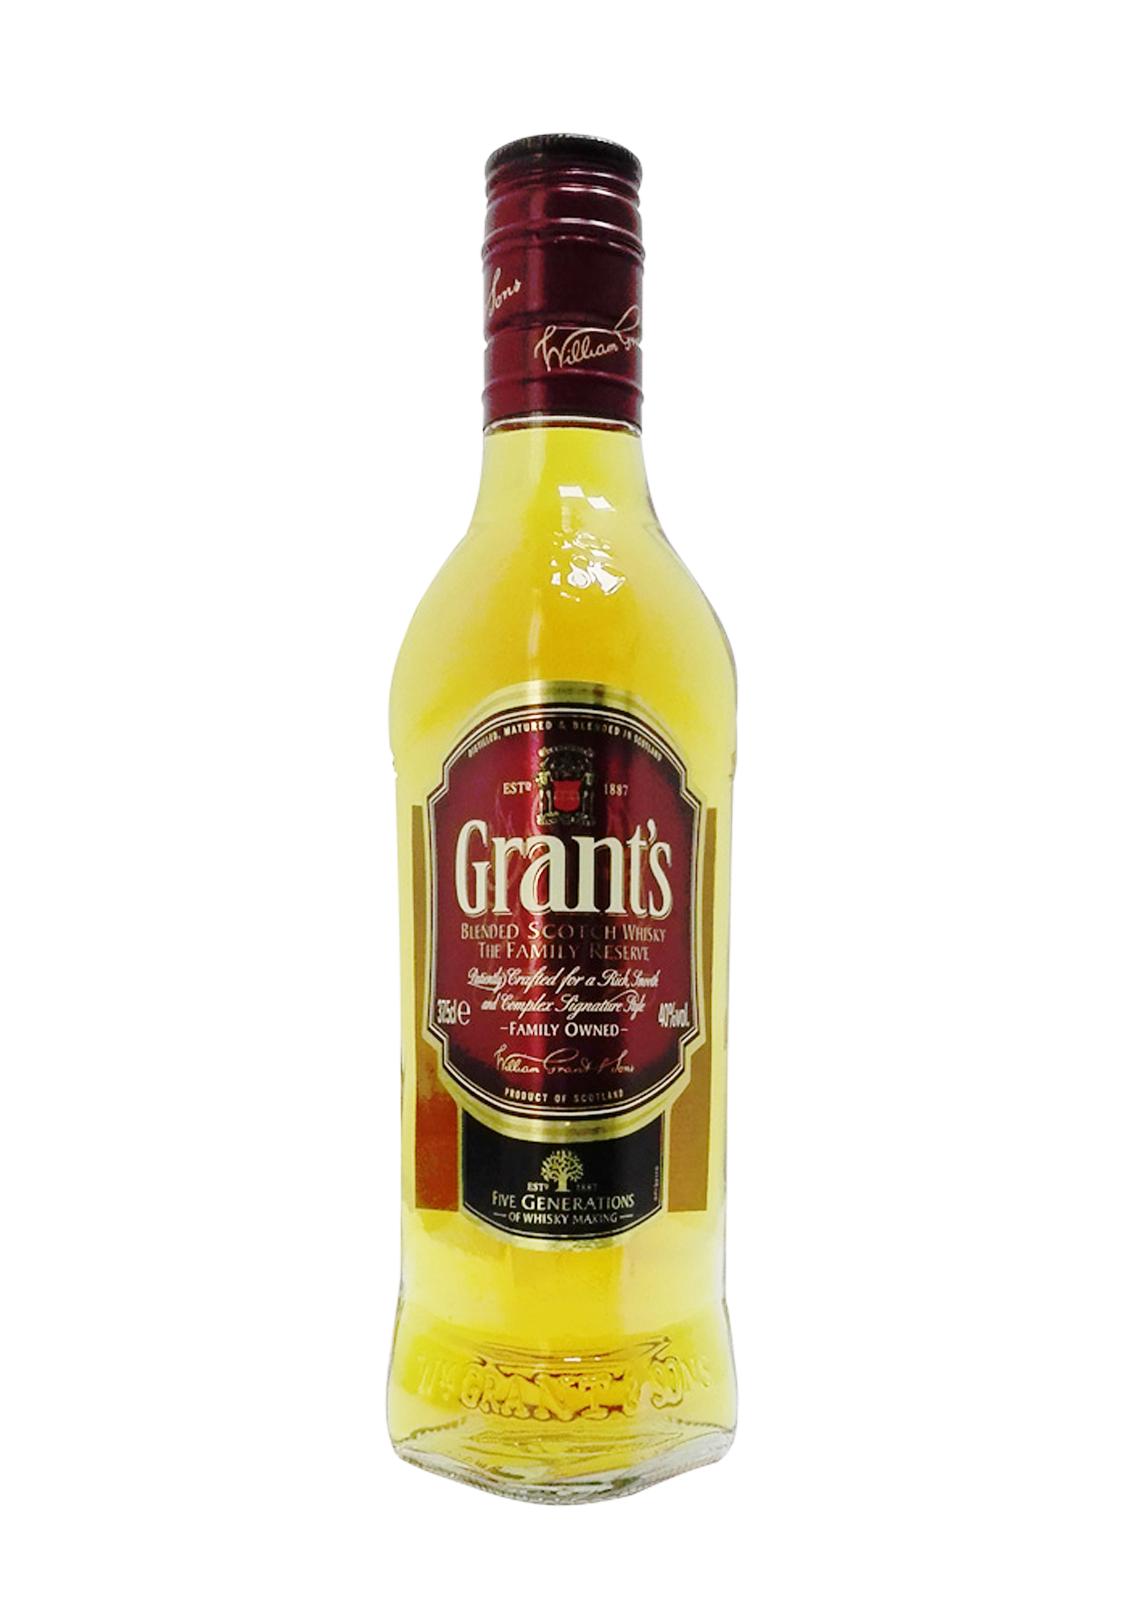 Виски grants (грантс): особенности вкуса и производства, обзор линейки бренда | inshaker | яндекс дзен